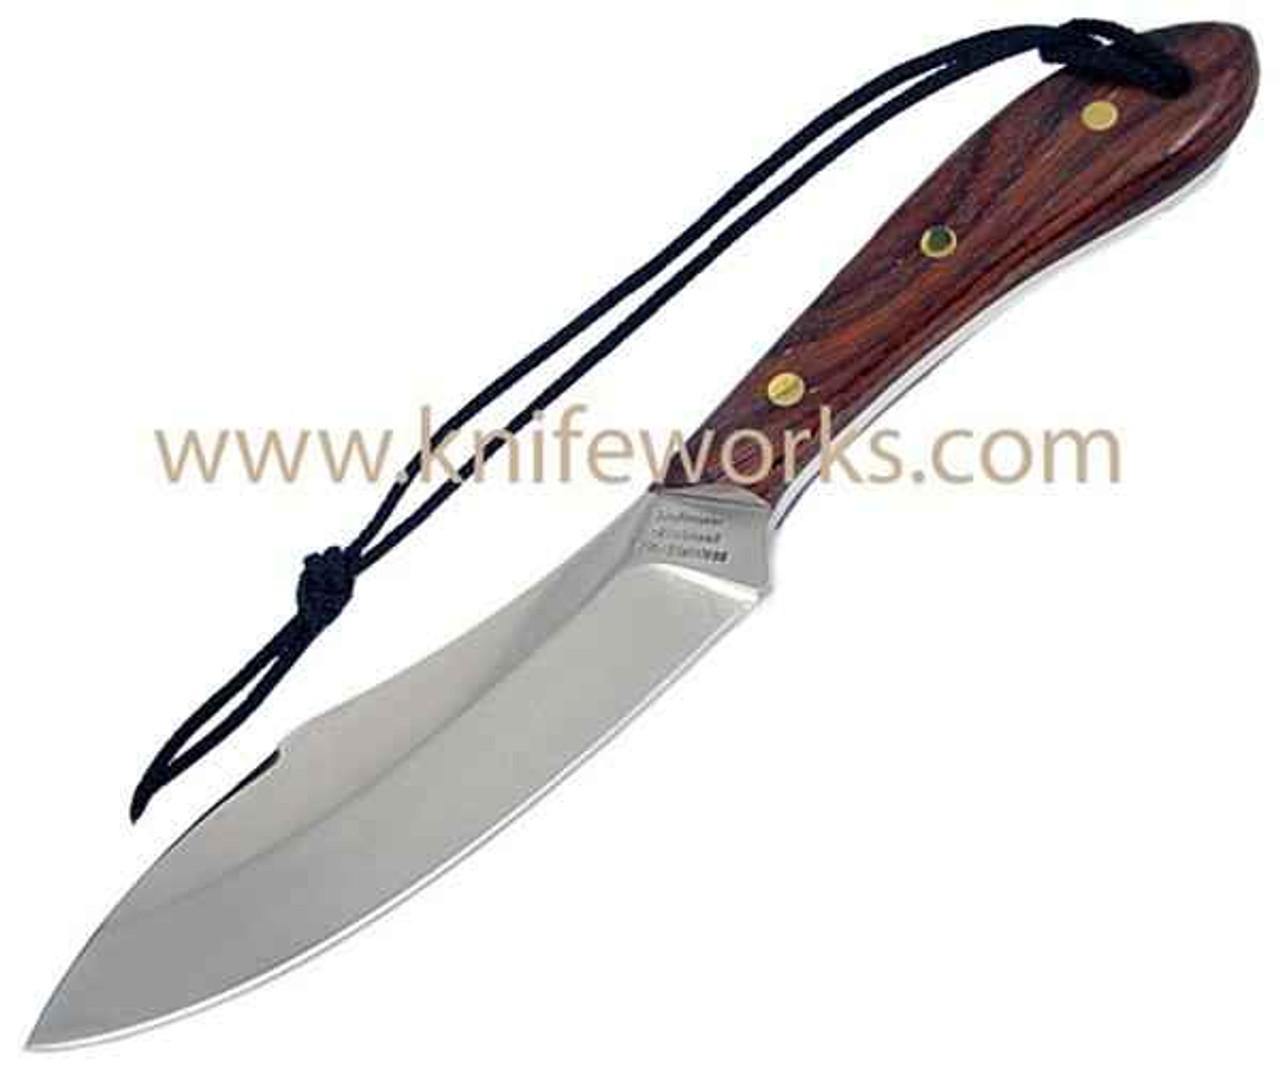 Grohmann Survival Knife, Rosewood handles